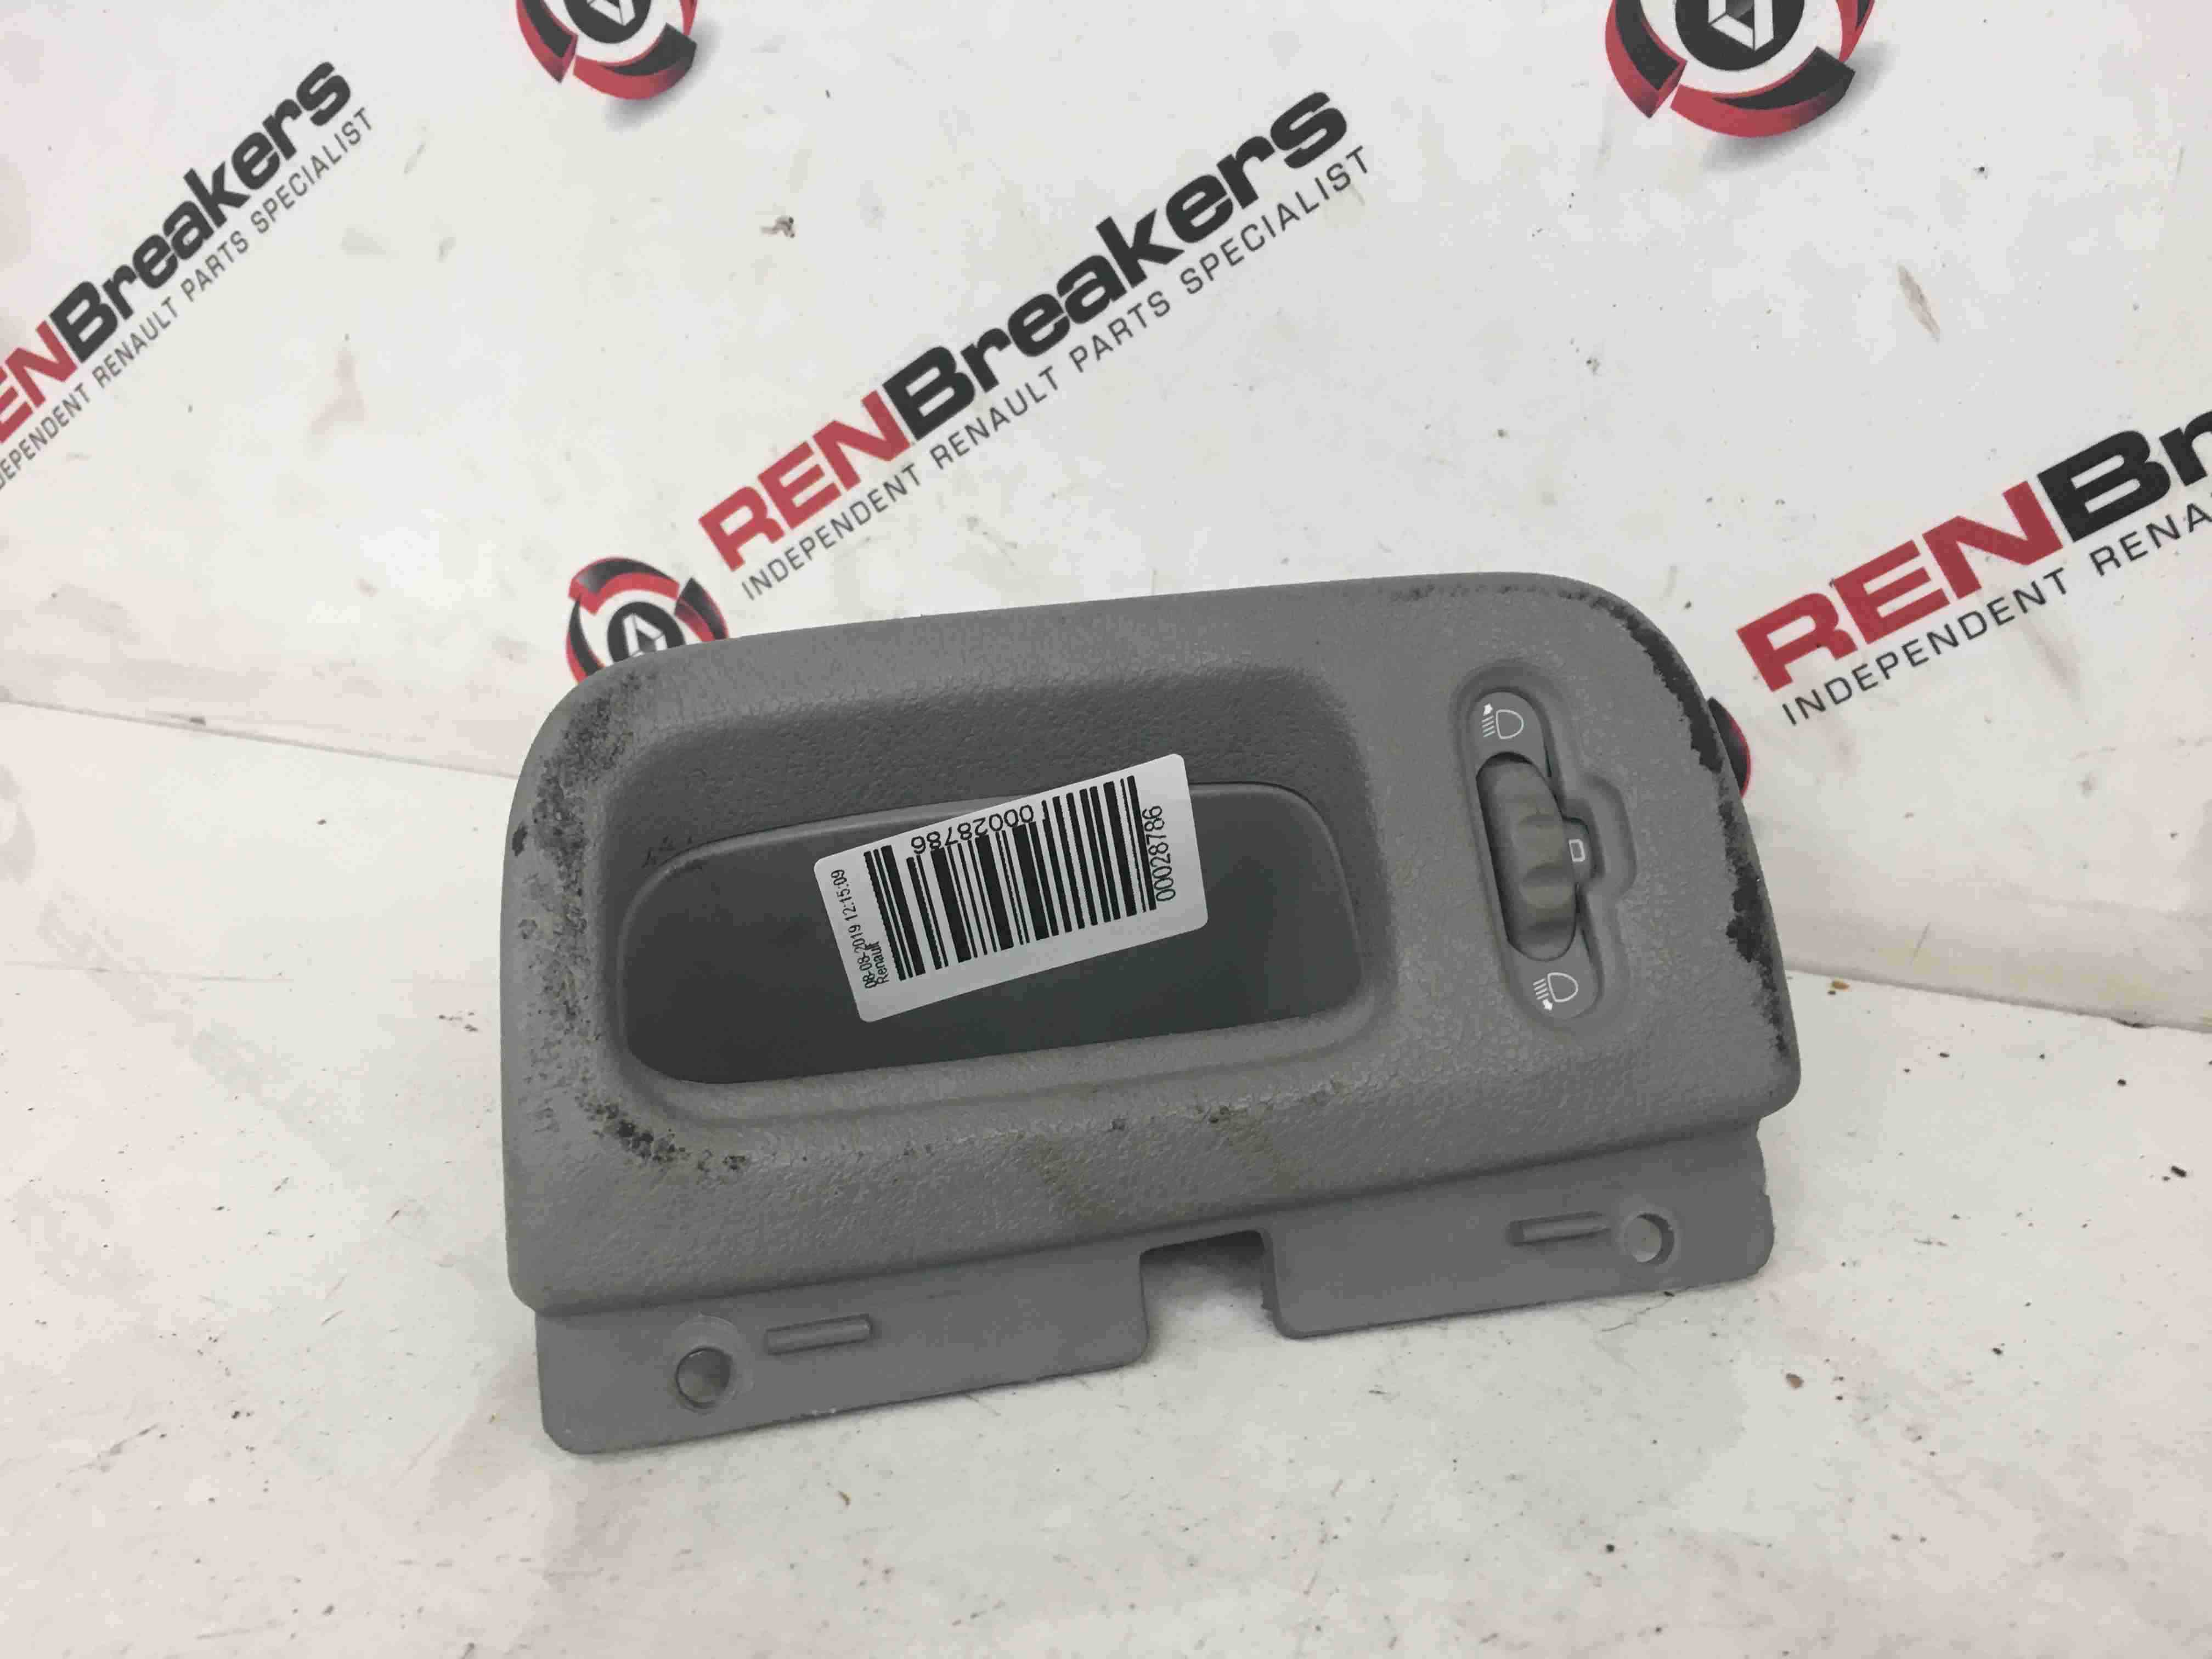 Renault Scenic MK1 1999-2003 Headlight Level Panel Tray Insert 7700431105